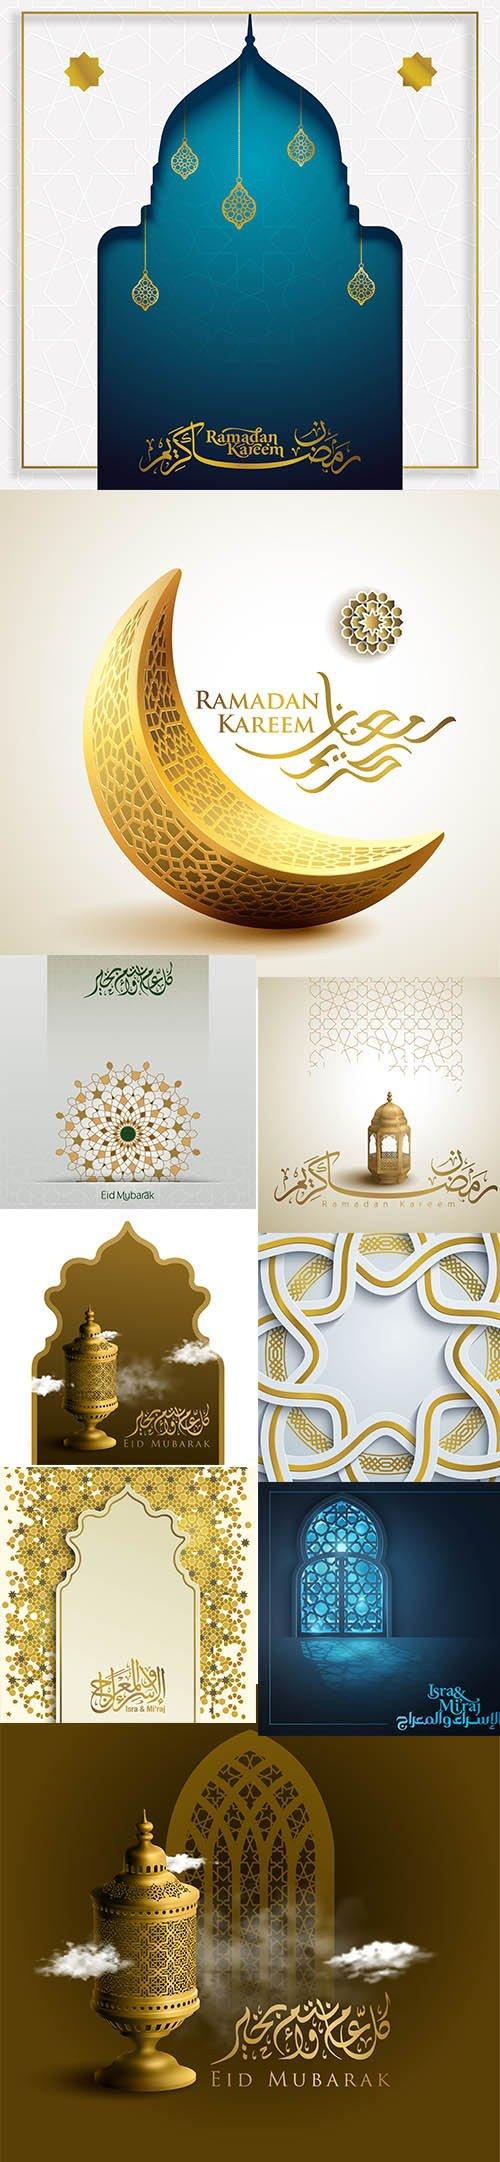 Arabic Calligraphy Illustrations